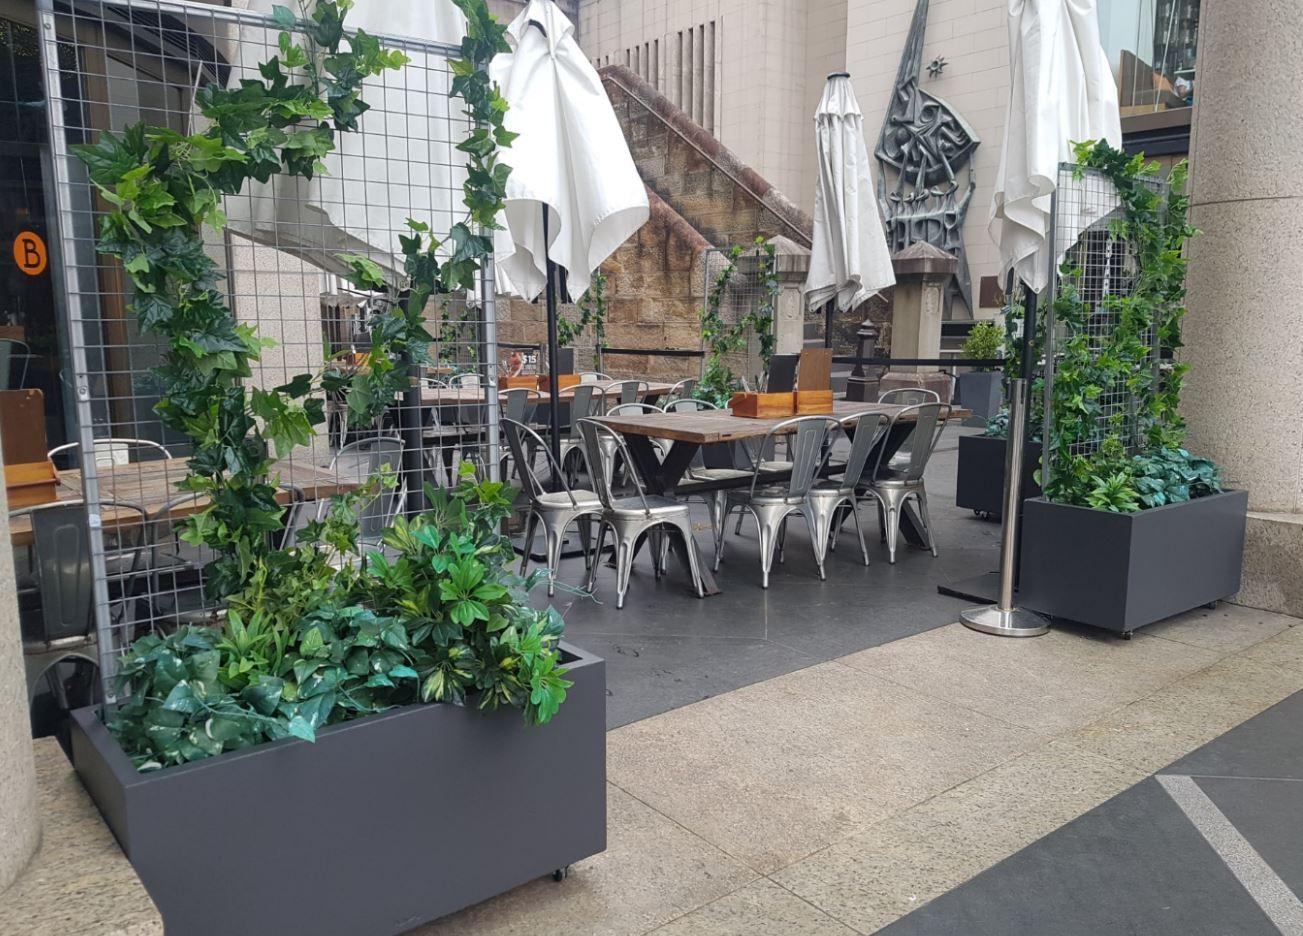 SMI National - Buckleys - Artificial Plants Outside - reduced 1.JPG